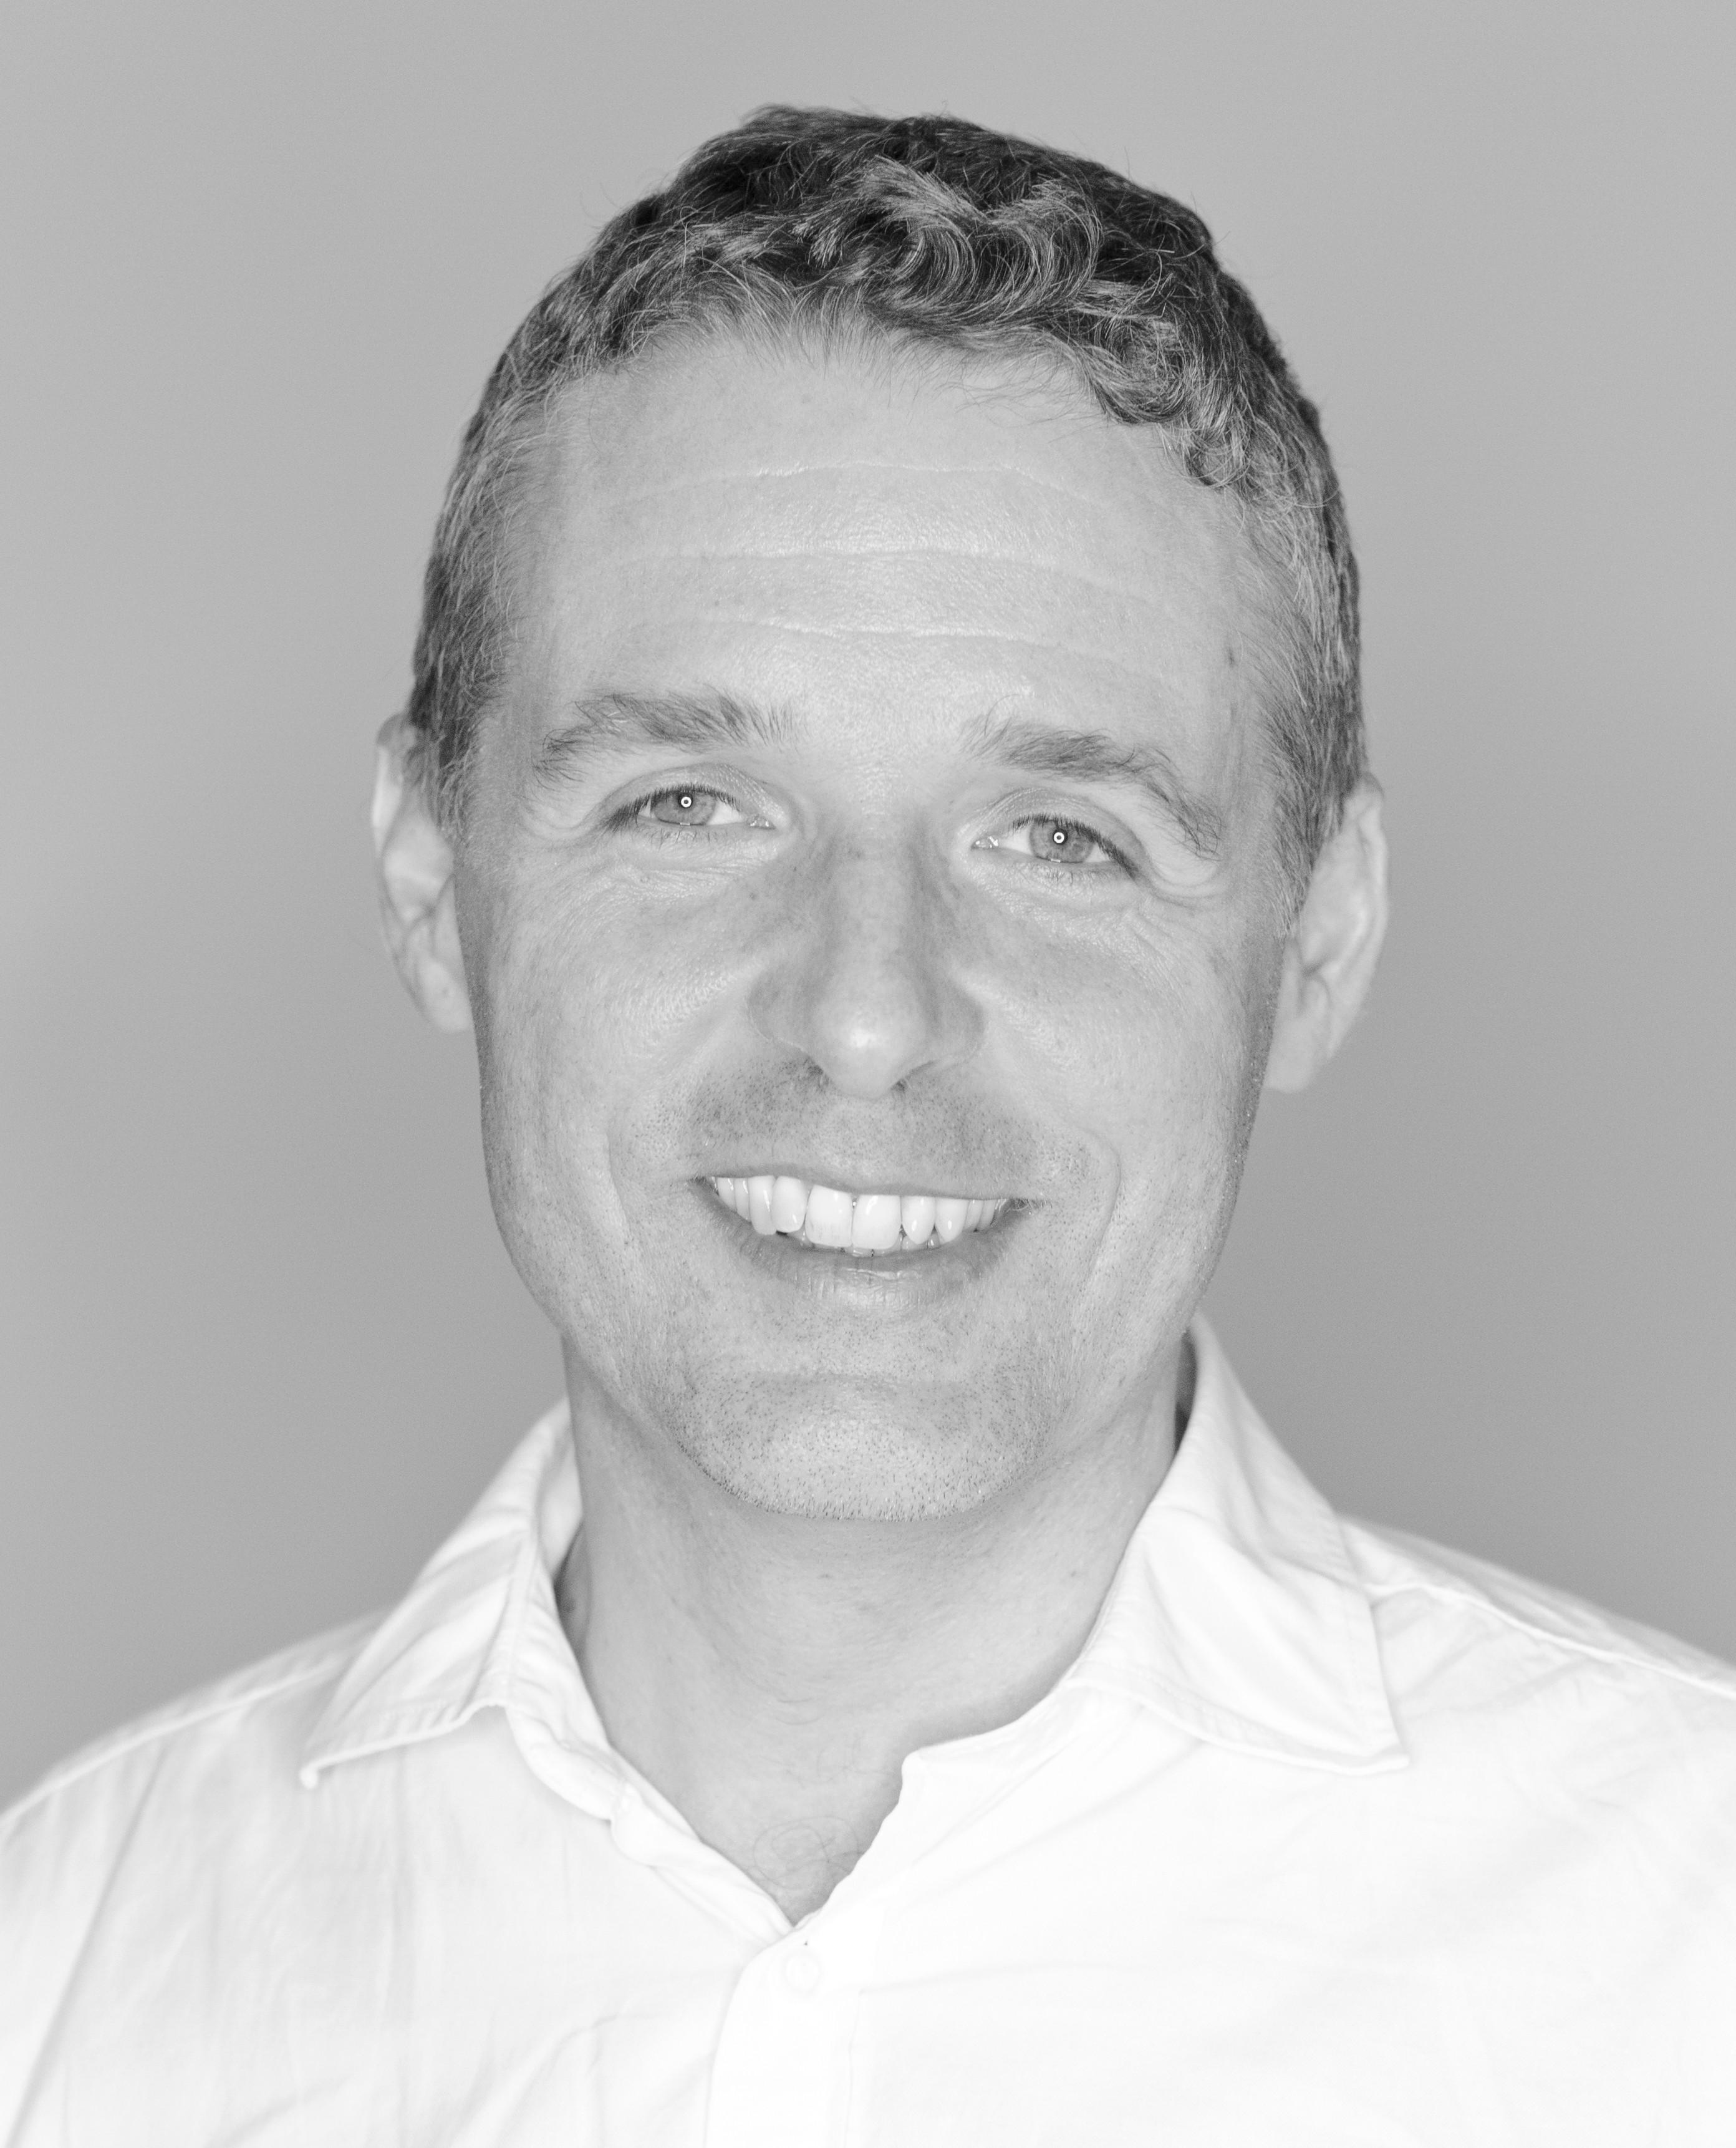 Stéphane TInner